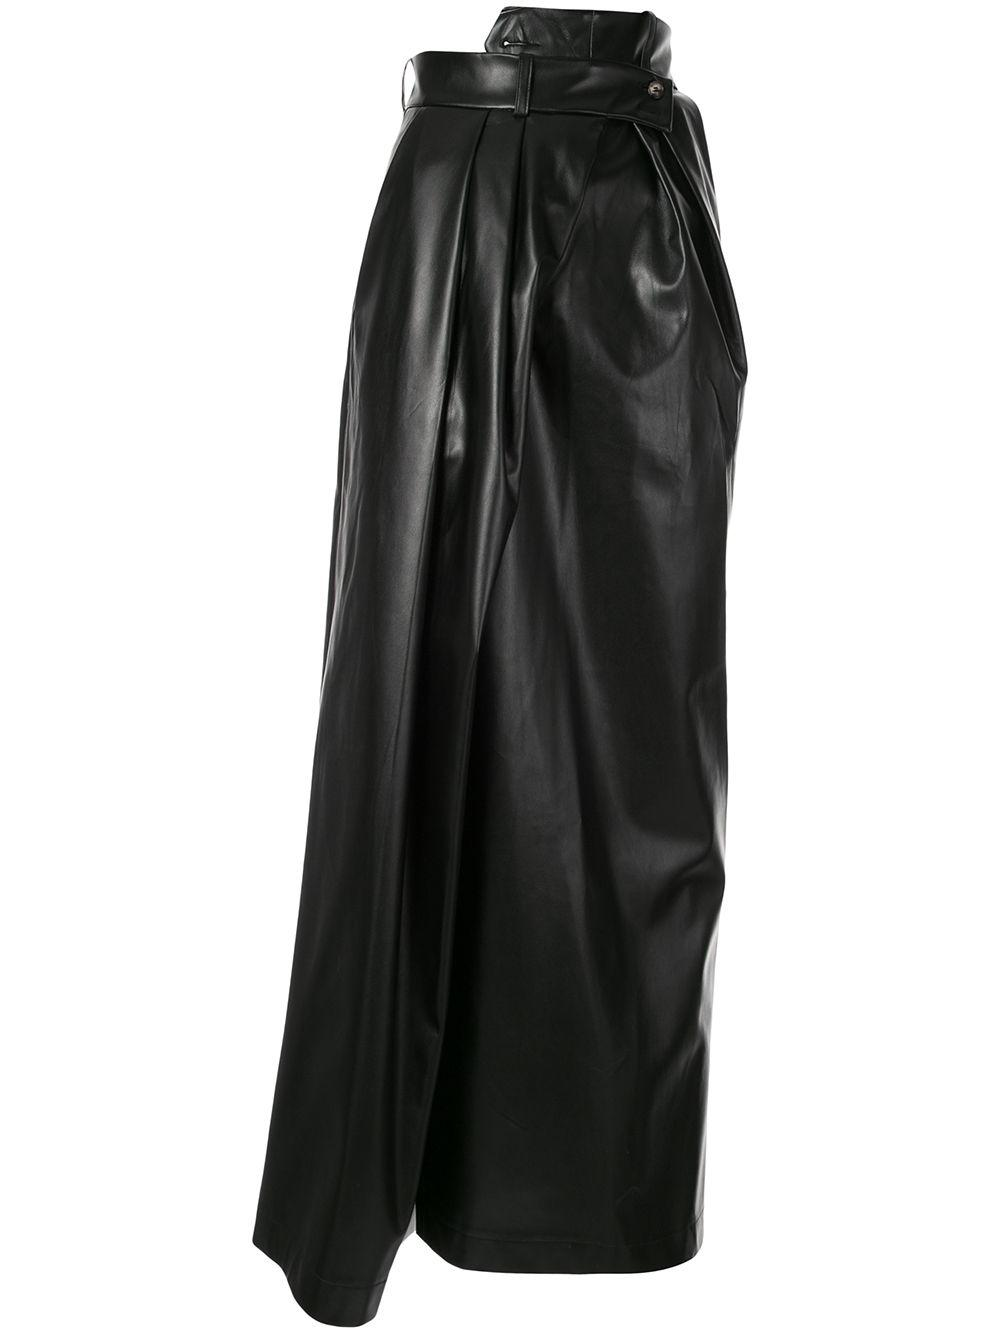 A.W.A.K.E. Mode юбка асимметричного кроя с запахом